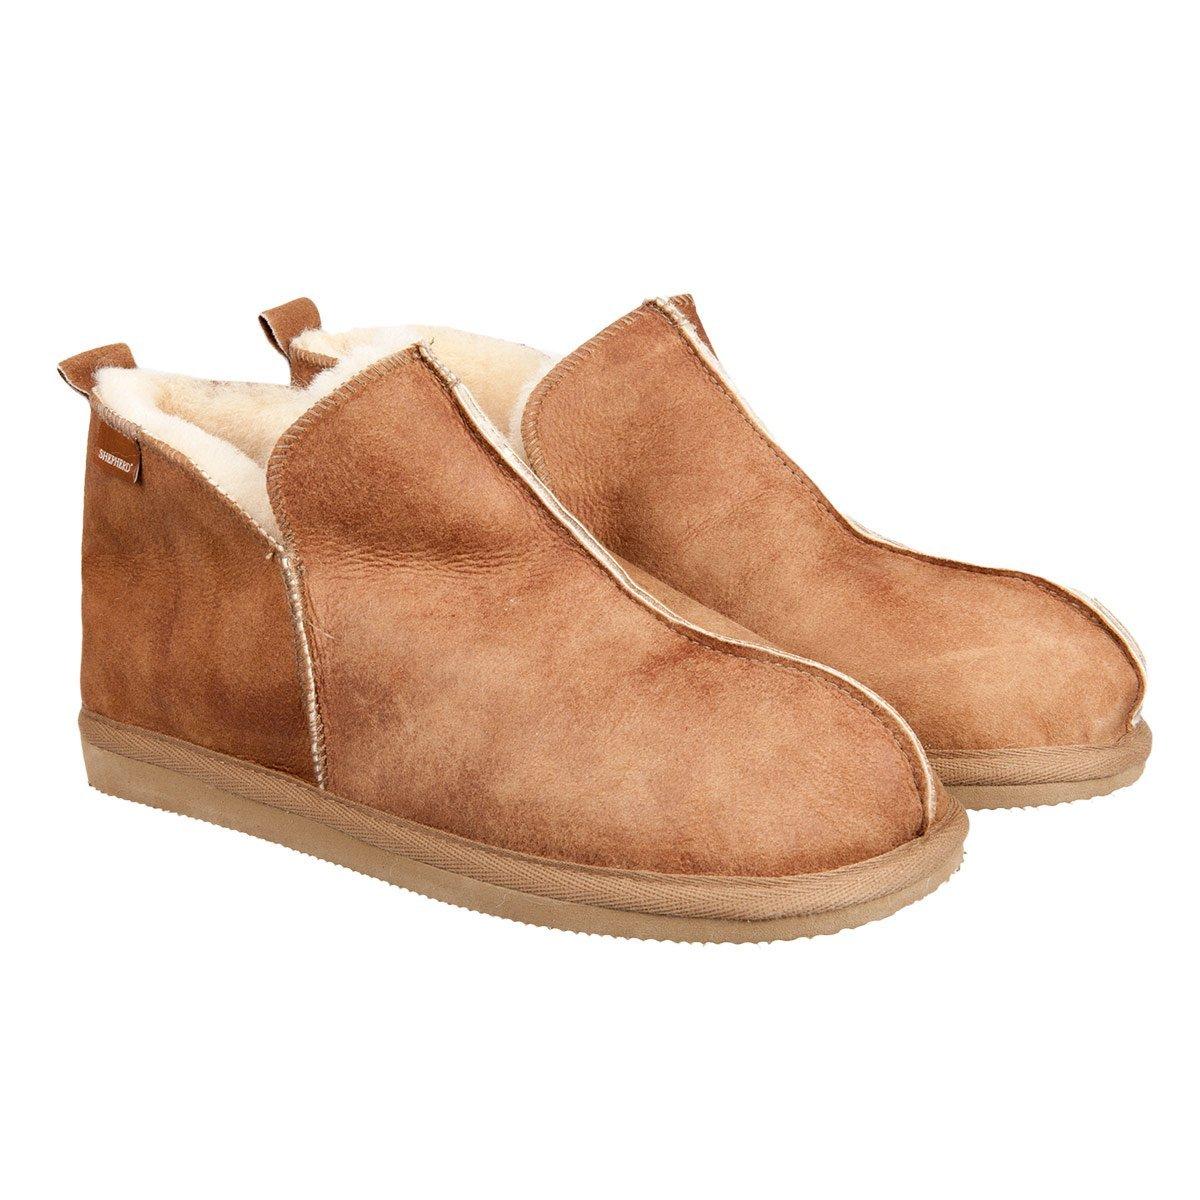 new product 82e7d 98268 pantofole in montone da uomo con suola antiscivola Anton Shepherd